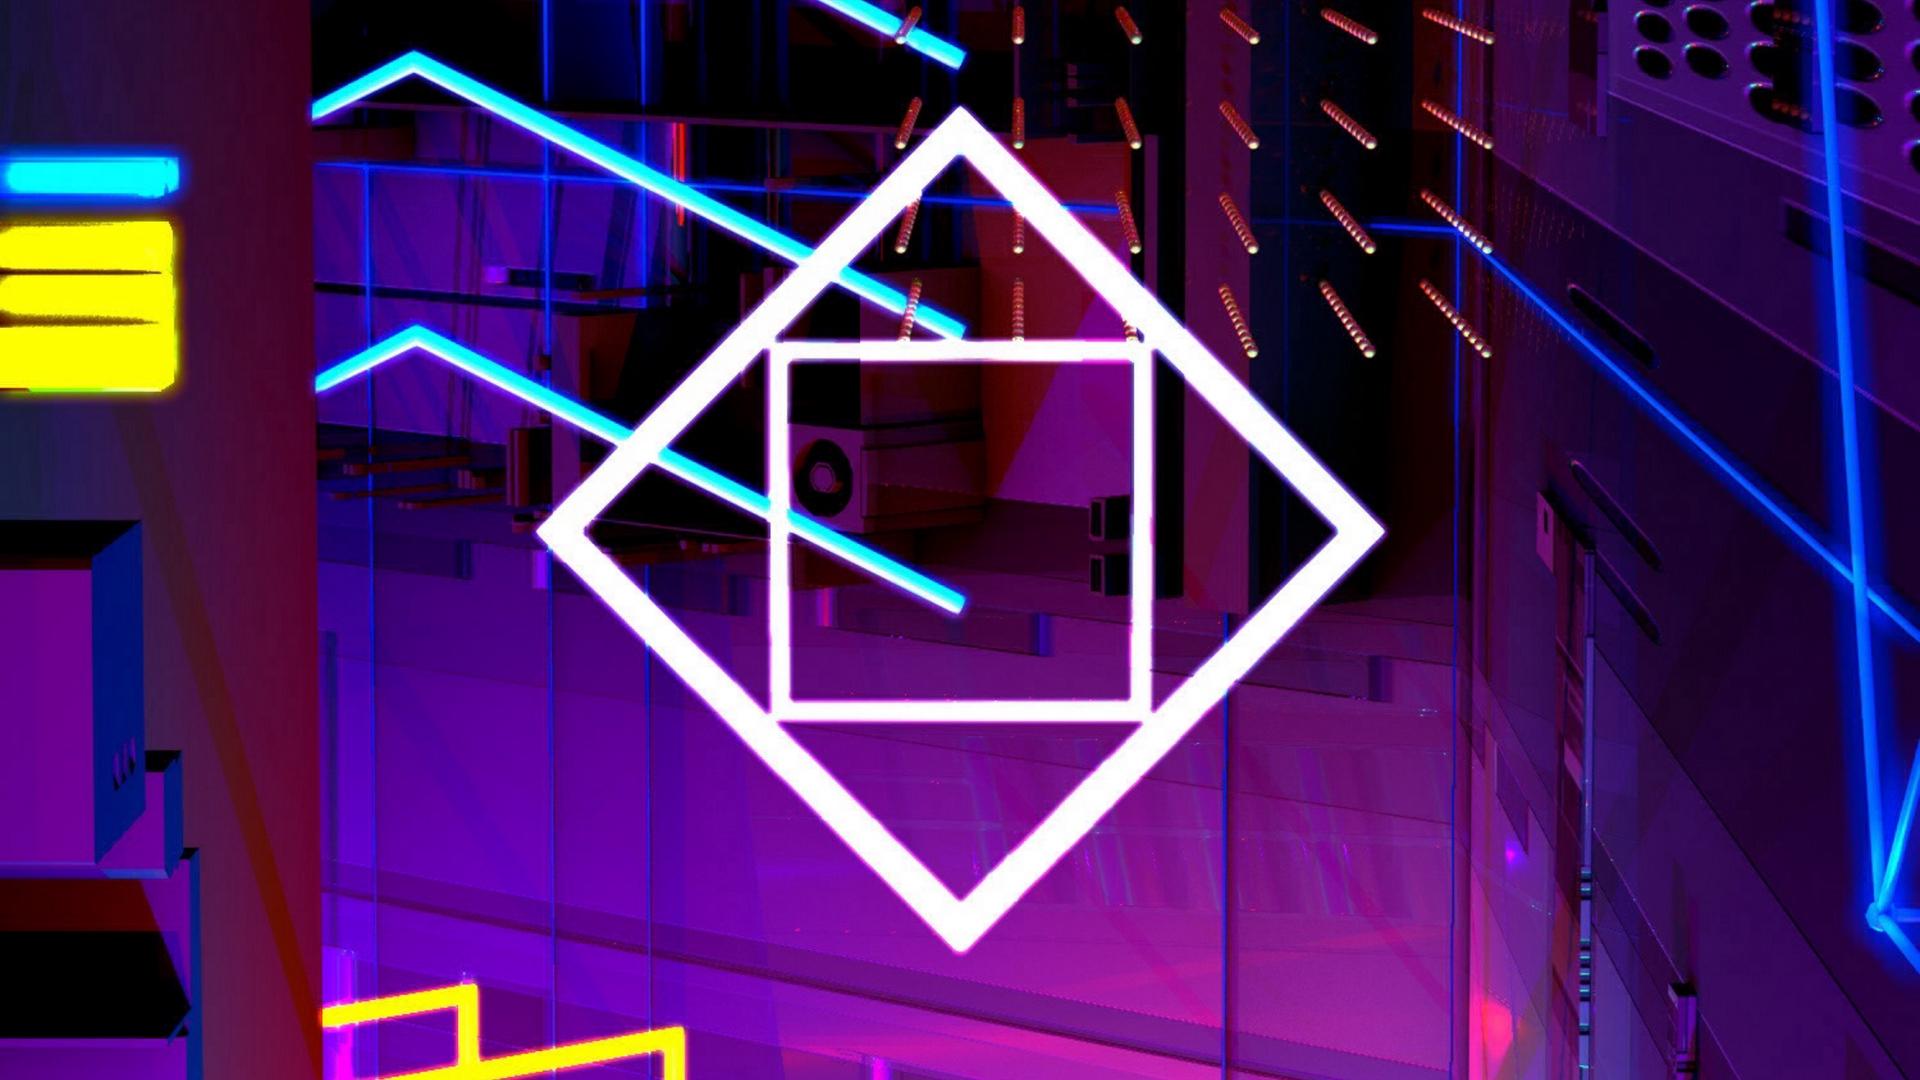 Wallpaper Neon, Glow, Colorful, Design - Neon Glow - HD Wallpaper